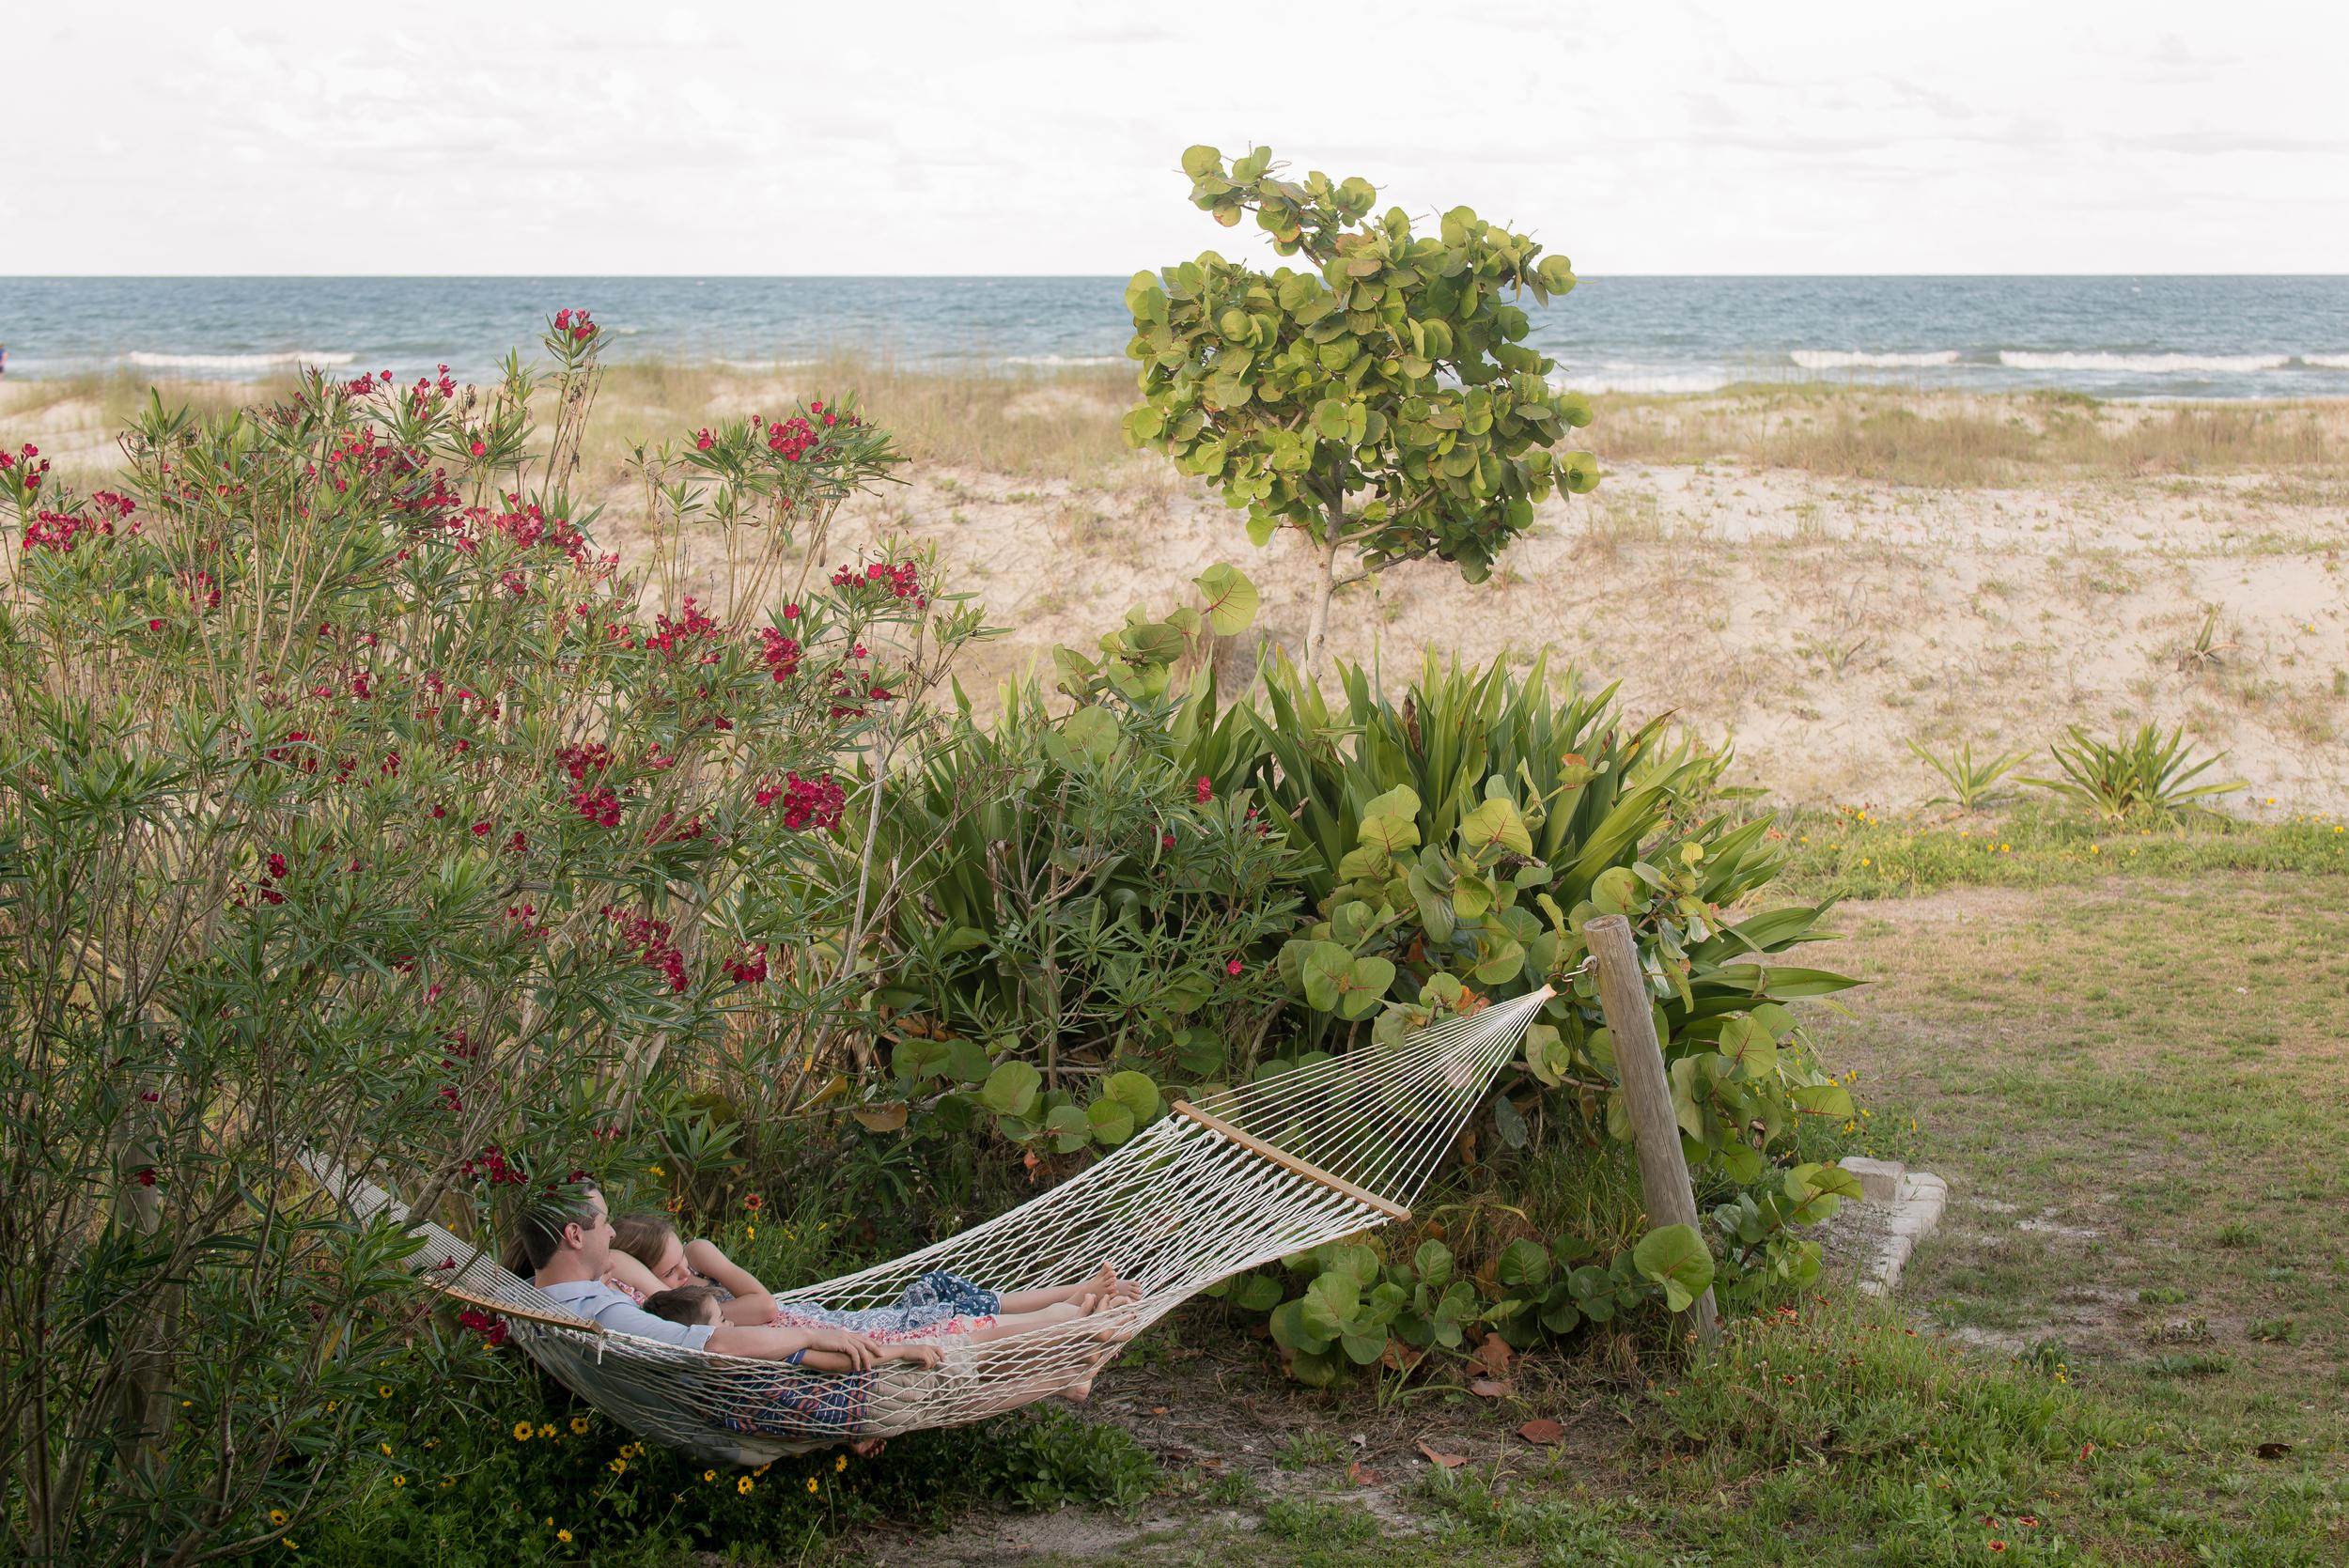 st-augustine-beach-family-portrait-photographer